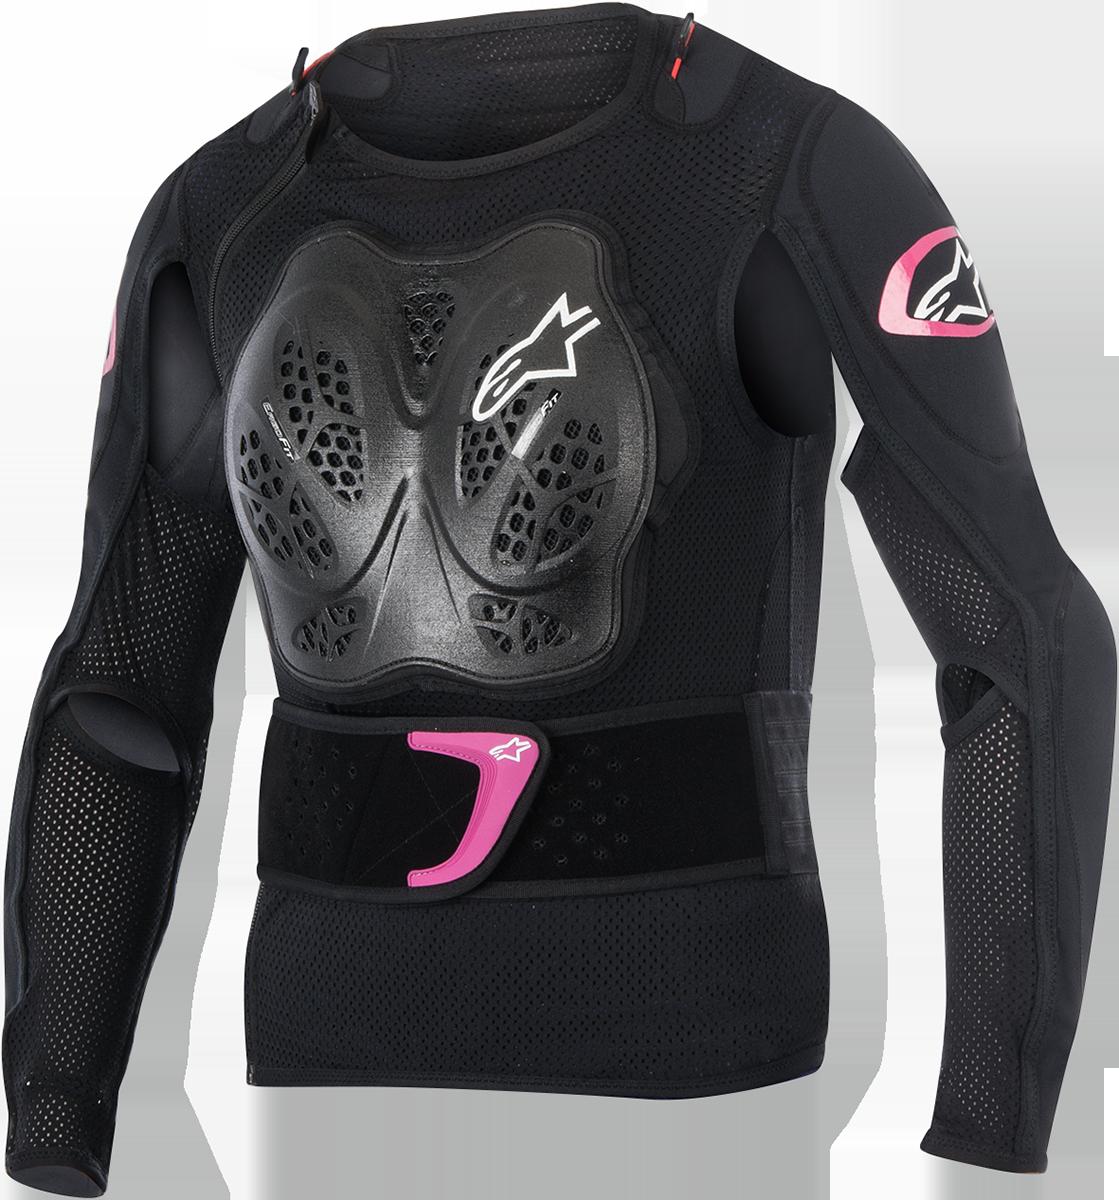 Alpinestars Pink Black Stella Bionic Womens Armored Motorcycle Riding Jacket